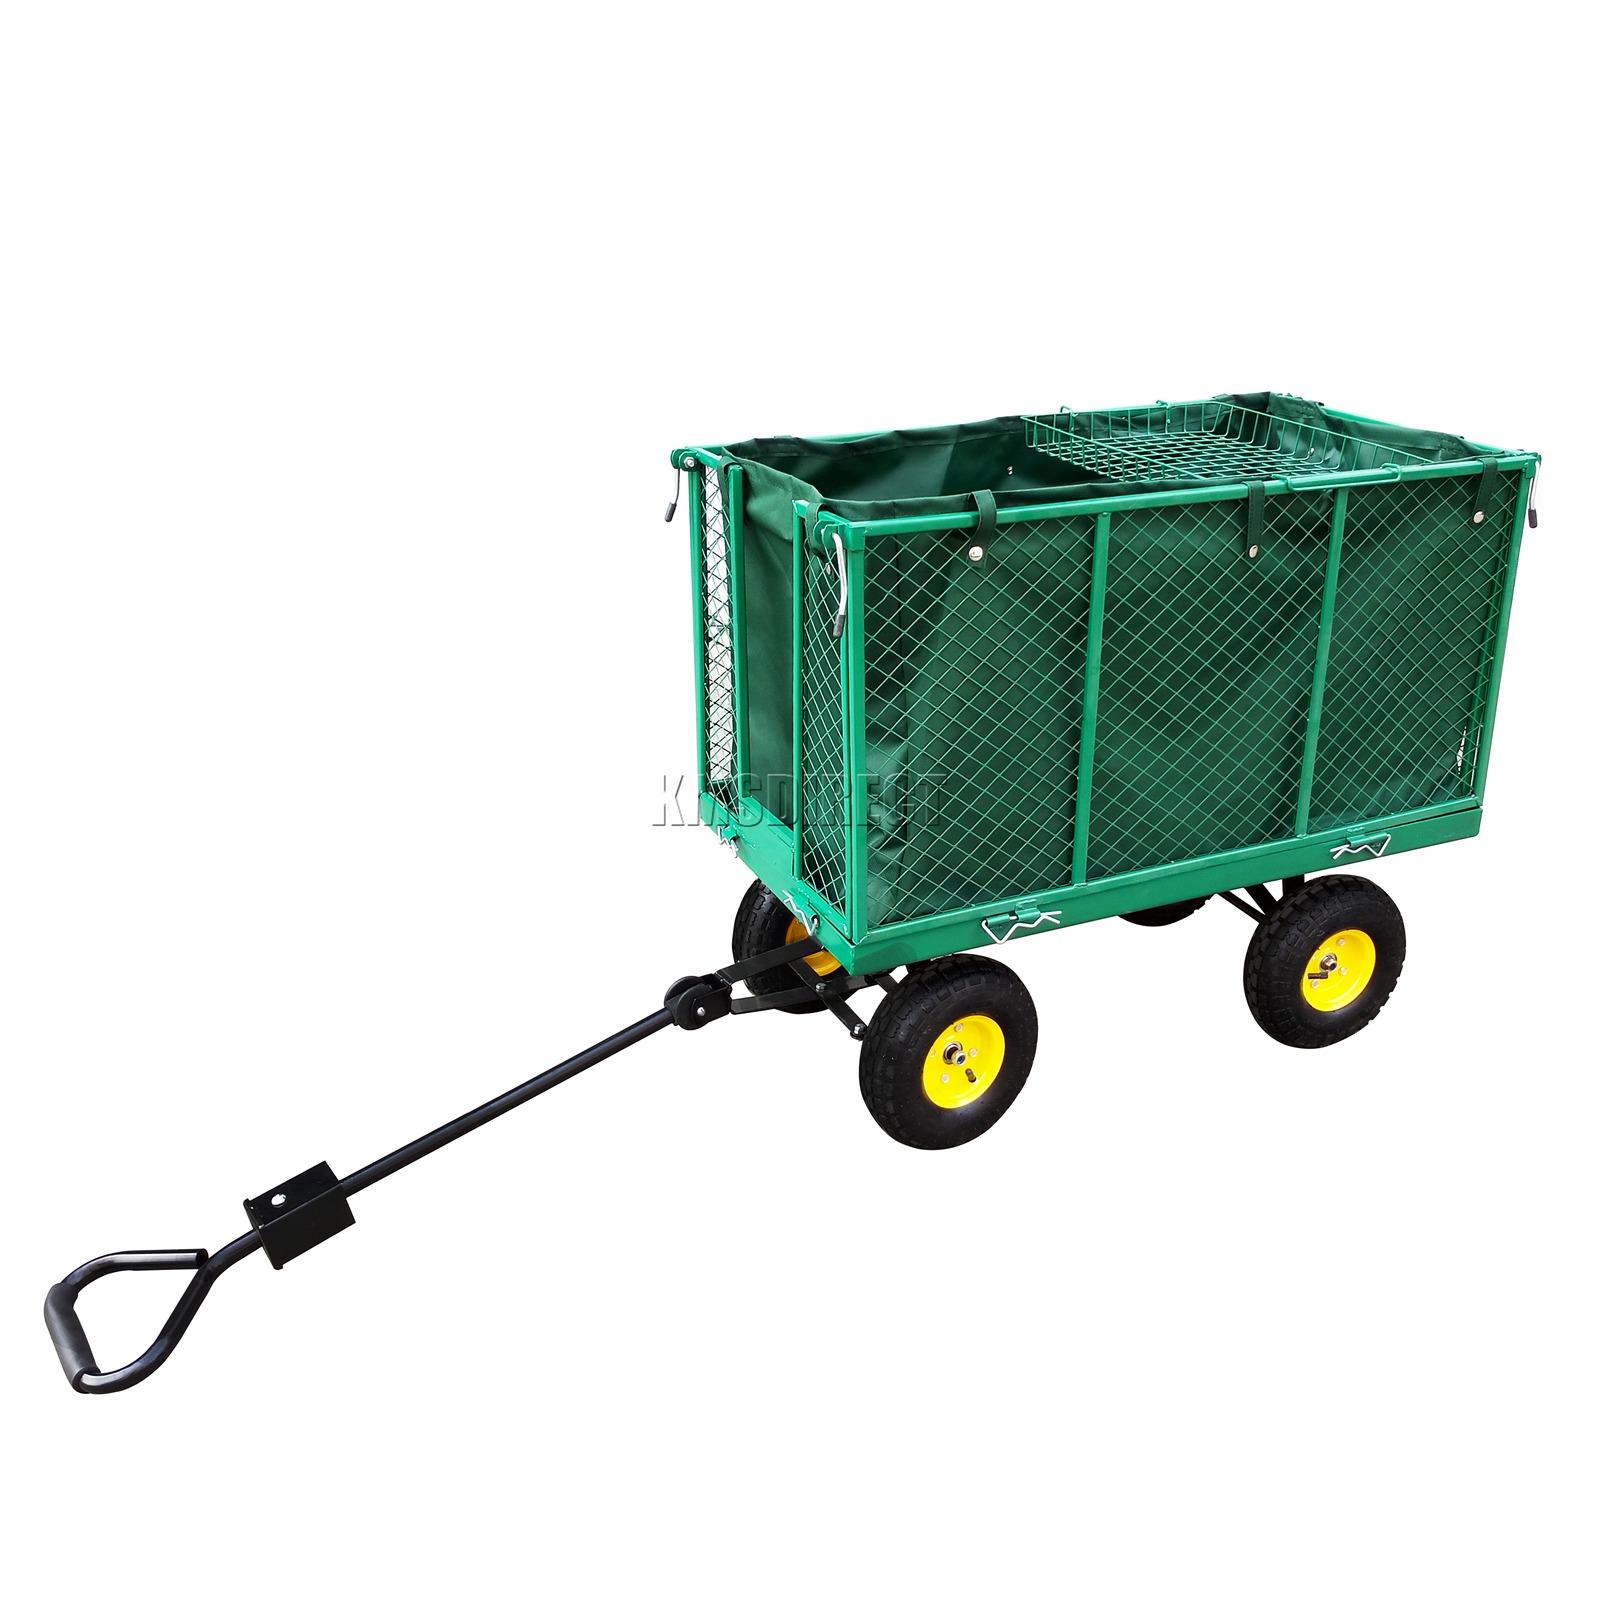 FoxHunter-Heavy-Duty-Garden-Dump-Truck-Tipping-Trailer-Trolley-Cart-Wheelbarrow miniatuur 17